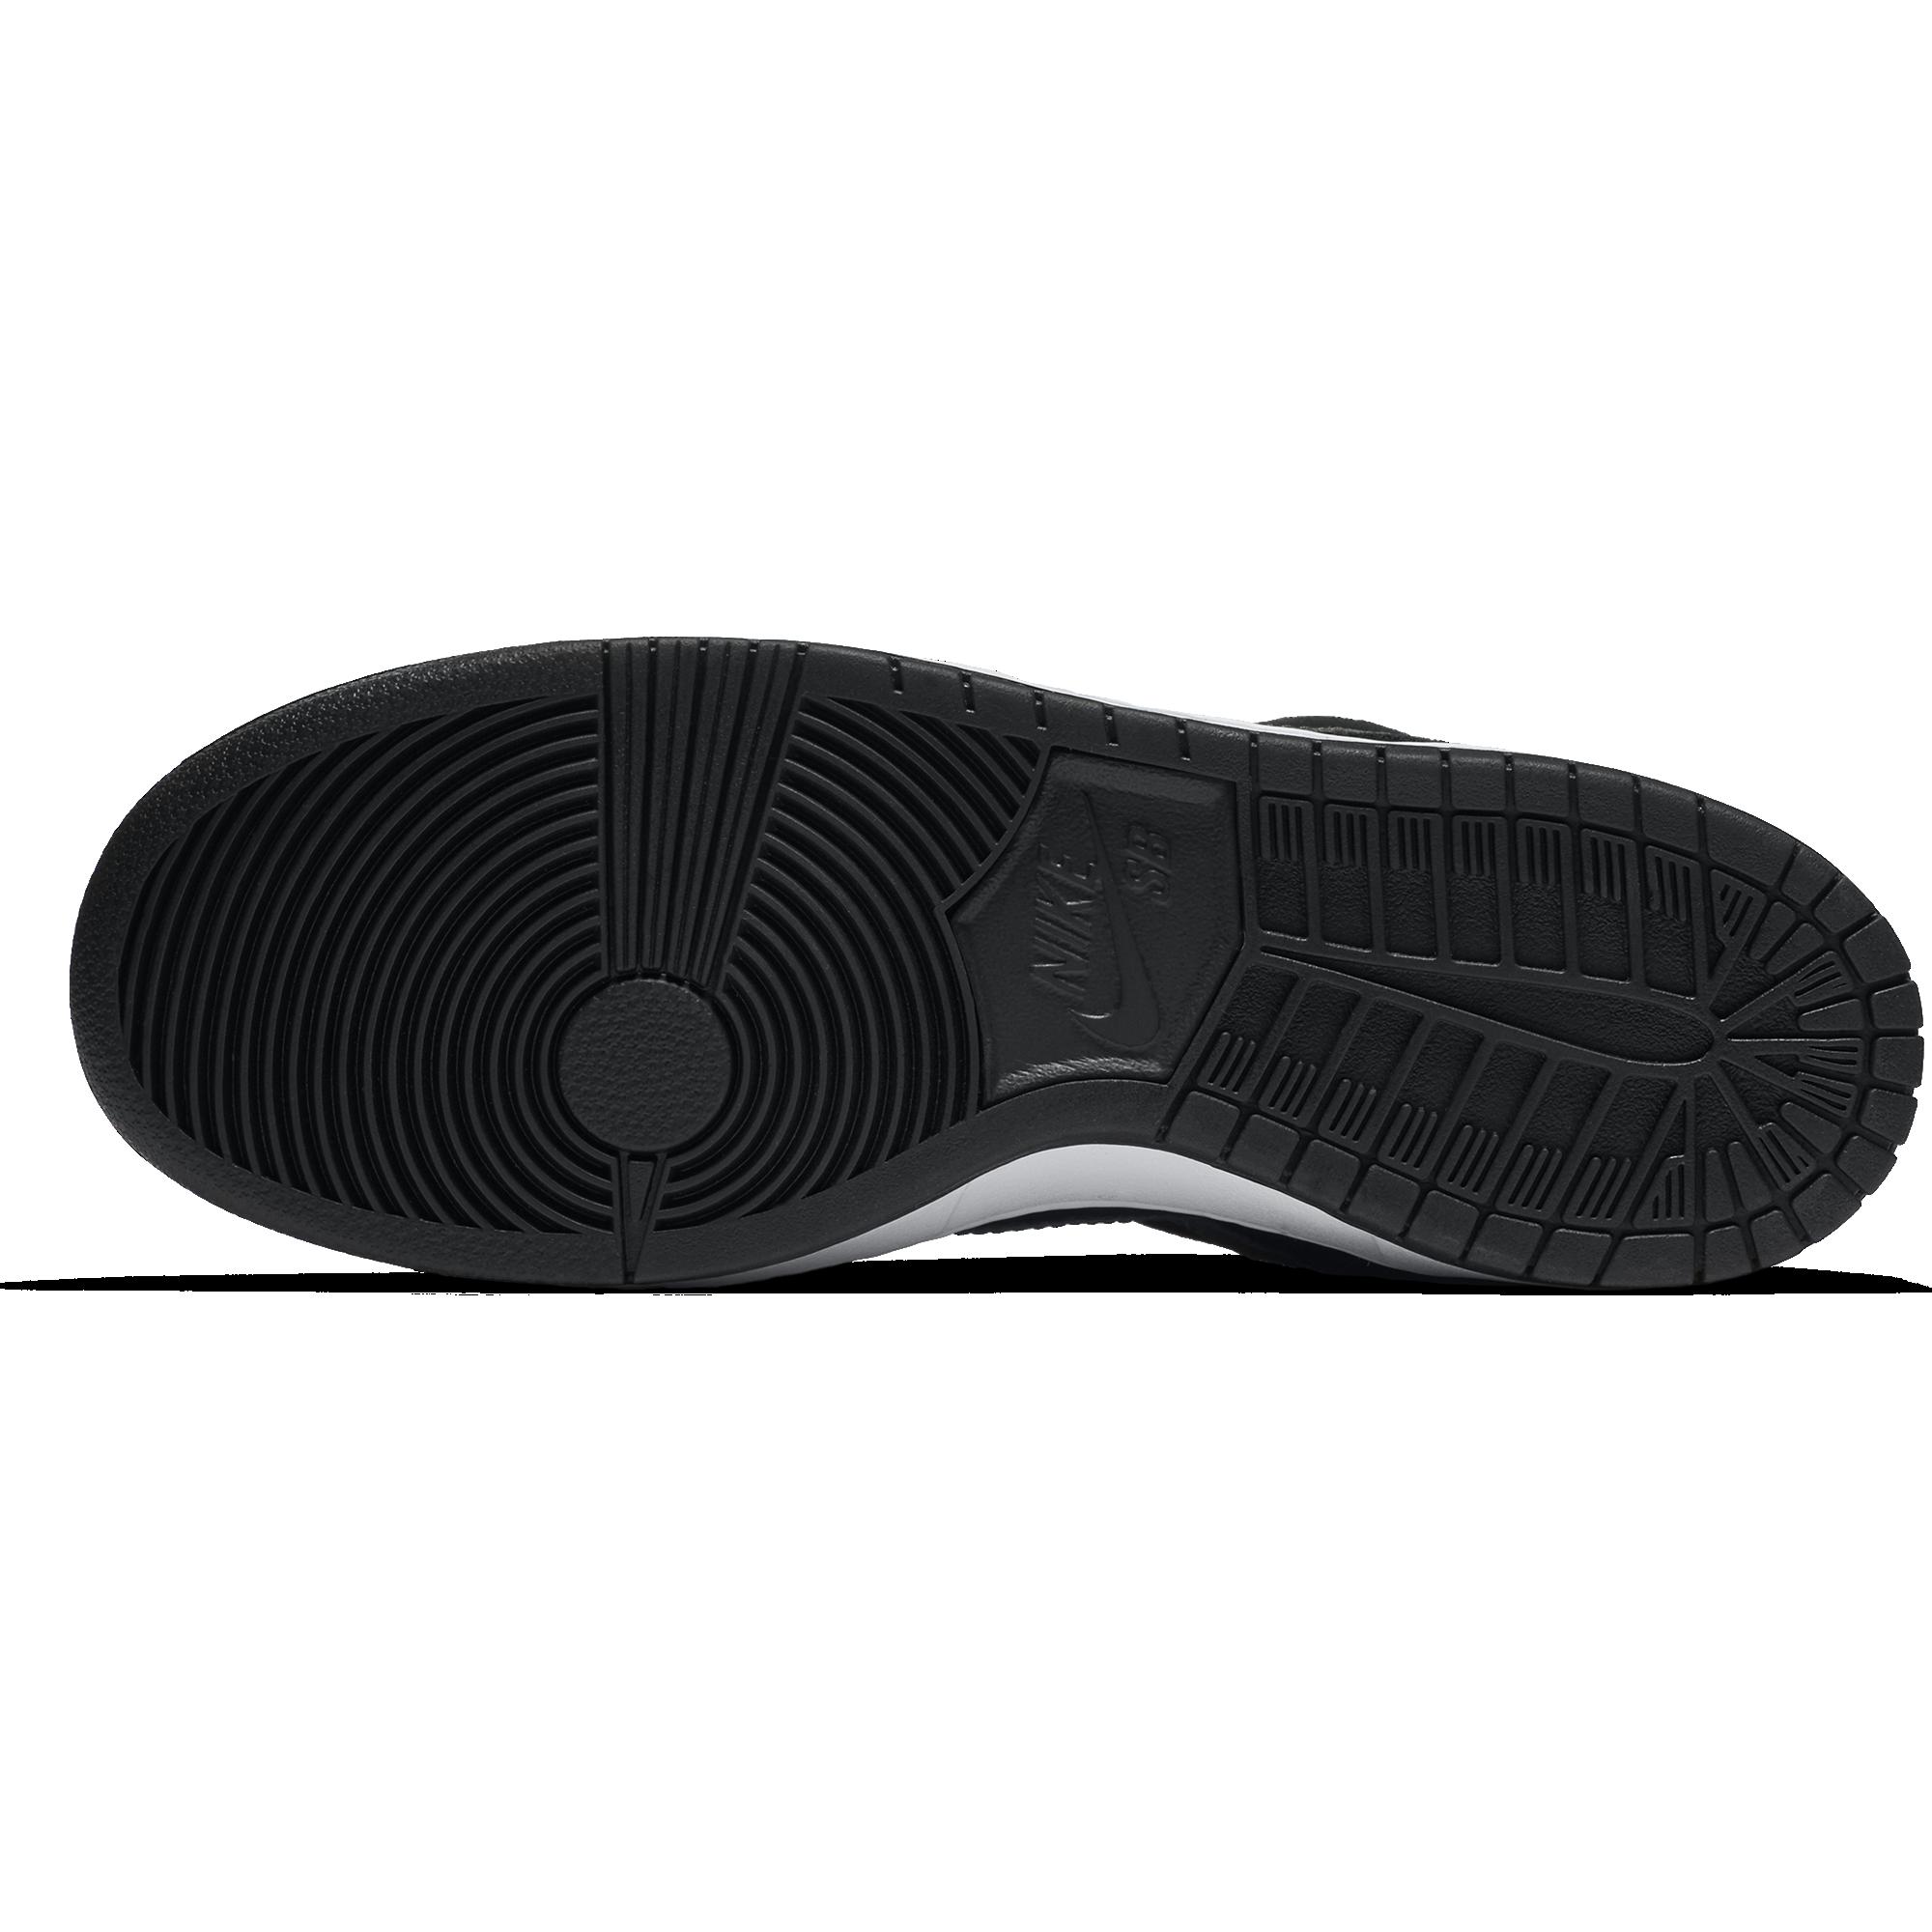 Nike SB Dunk Ishod